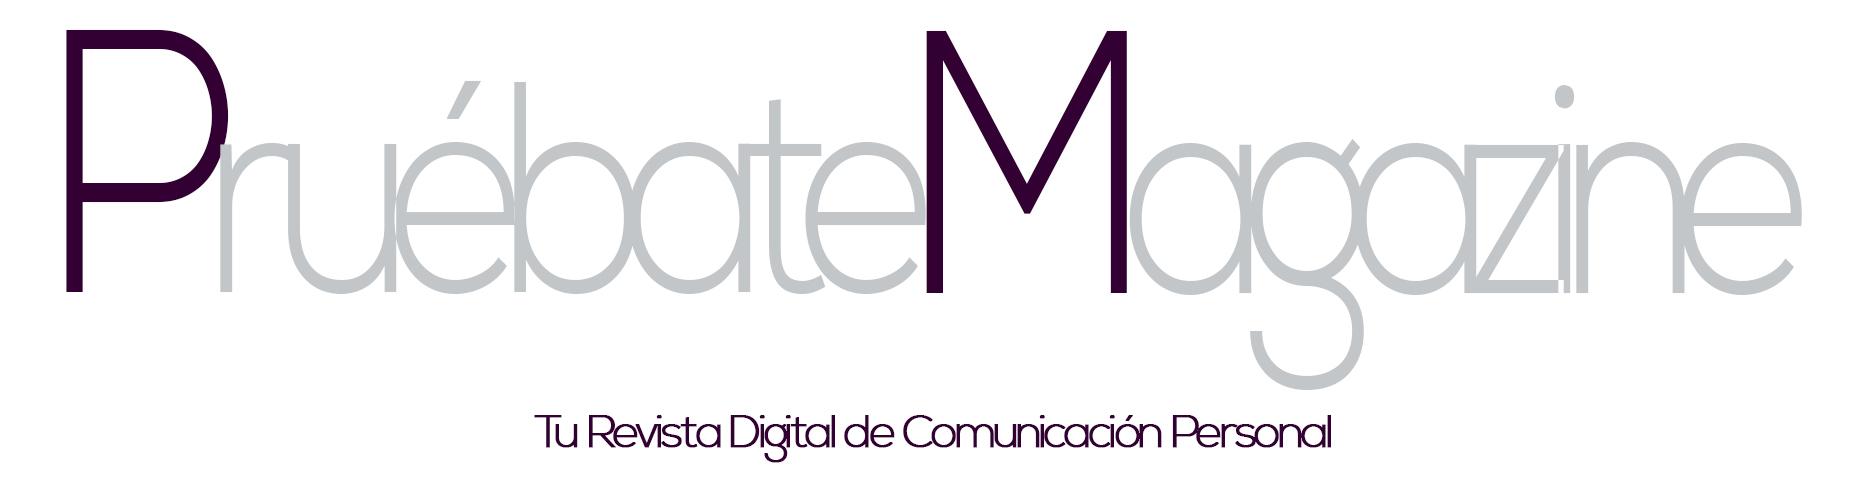 Comunicacion Personal, Habilidades Sociales, Emprendedores